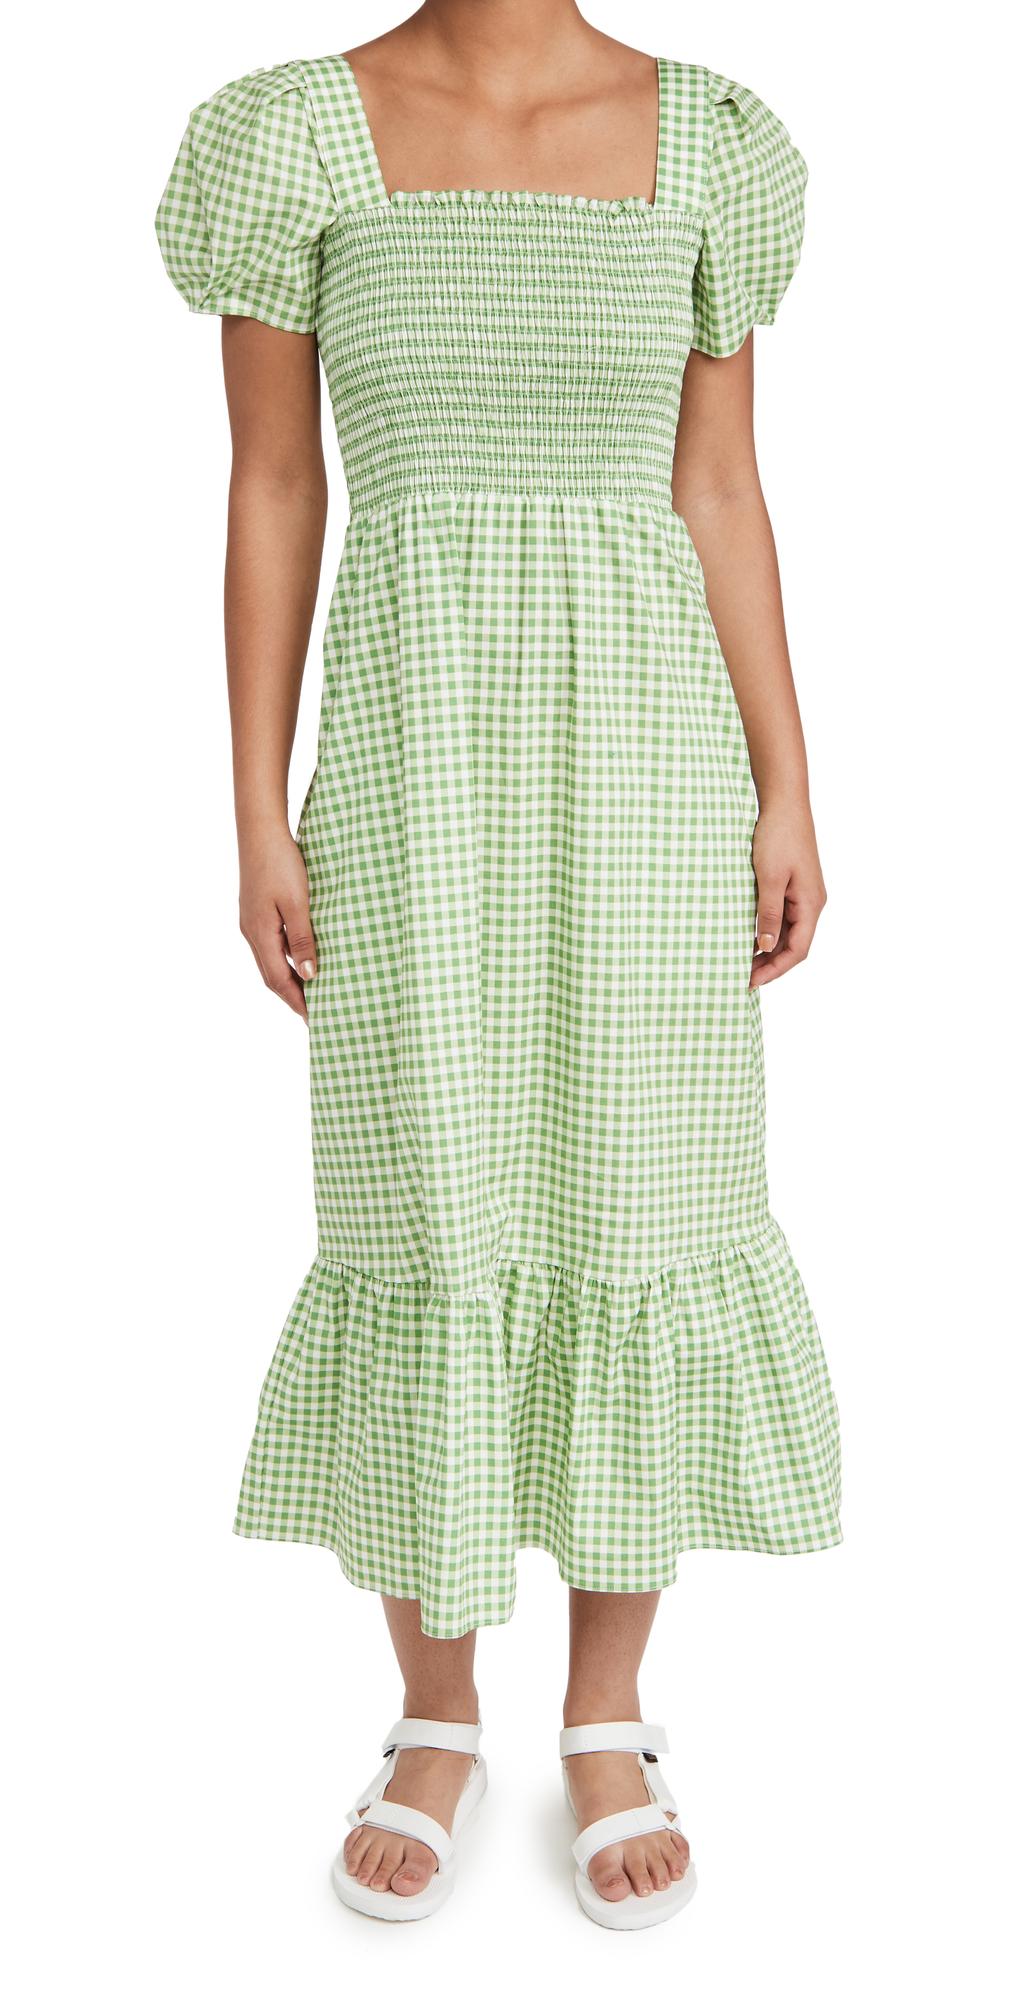 Smocked Fromer Square Neck Dress